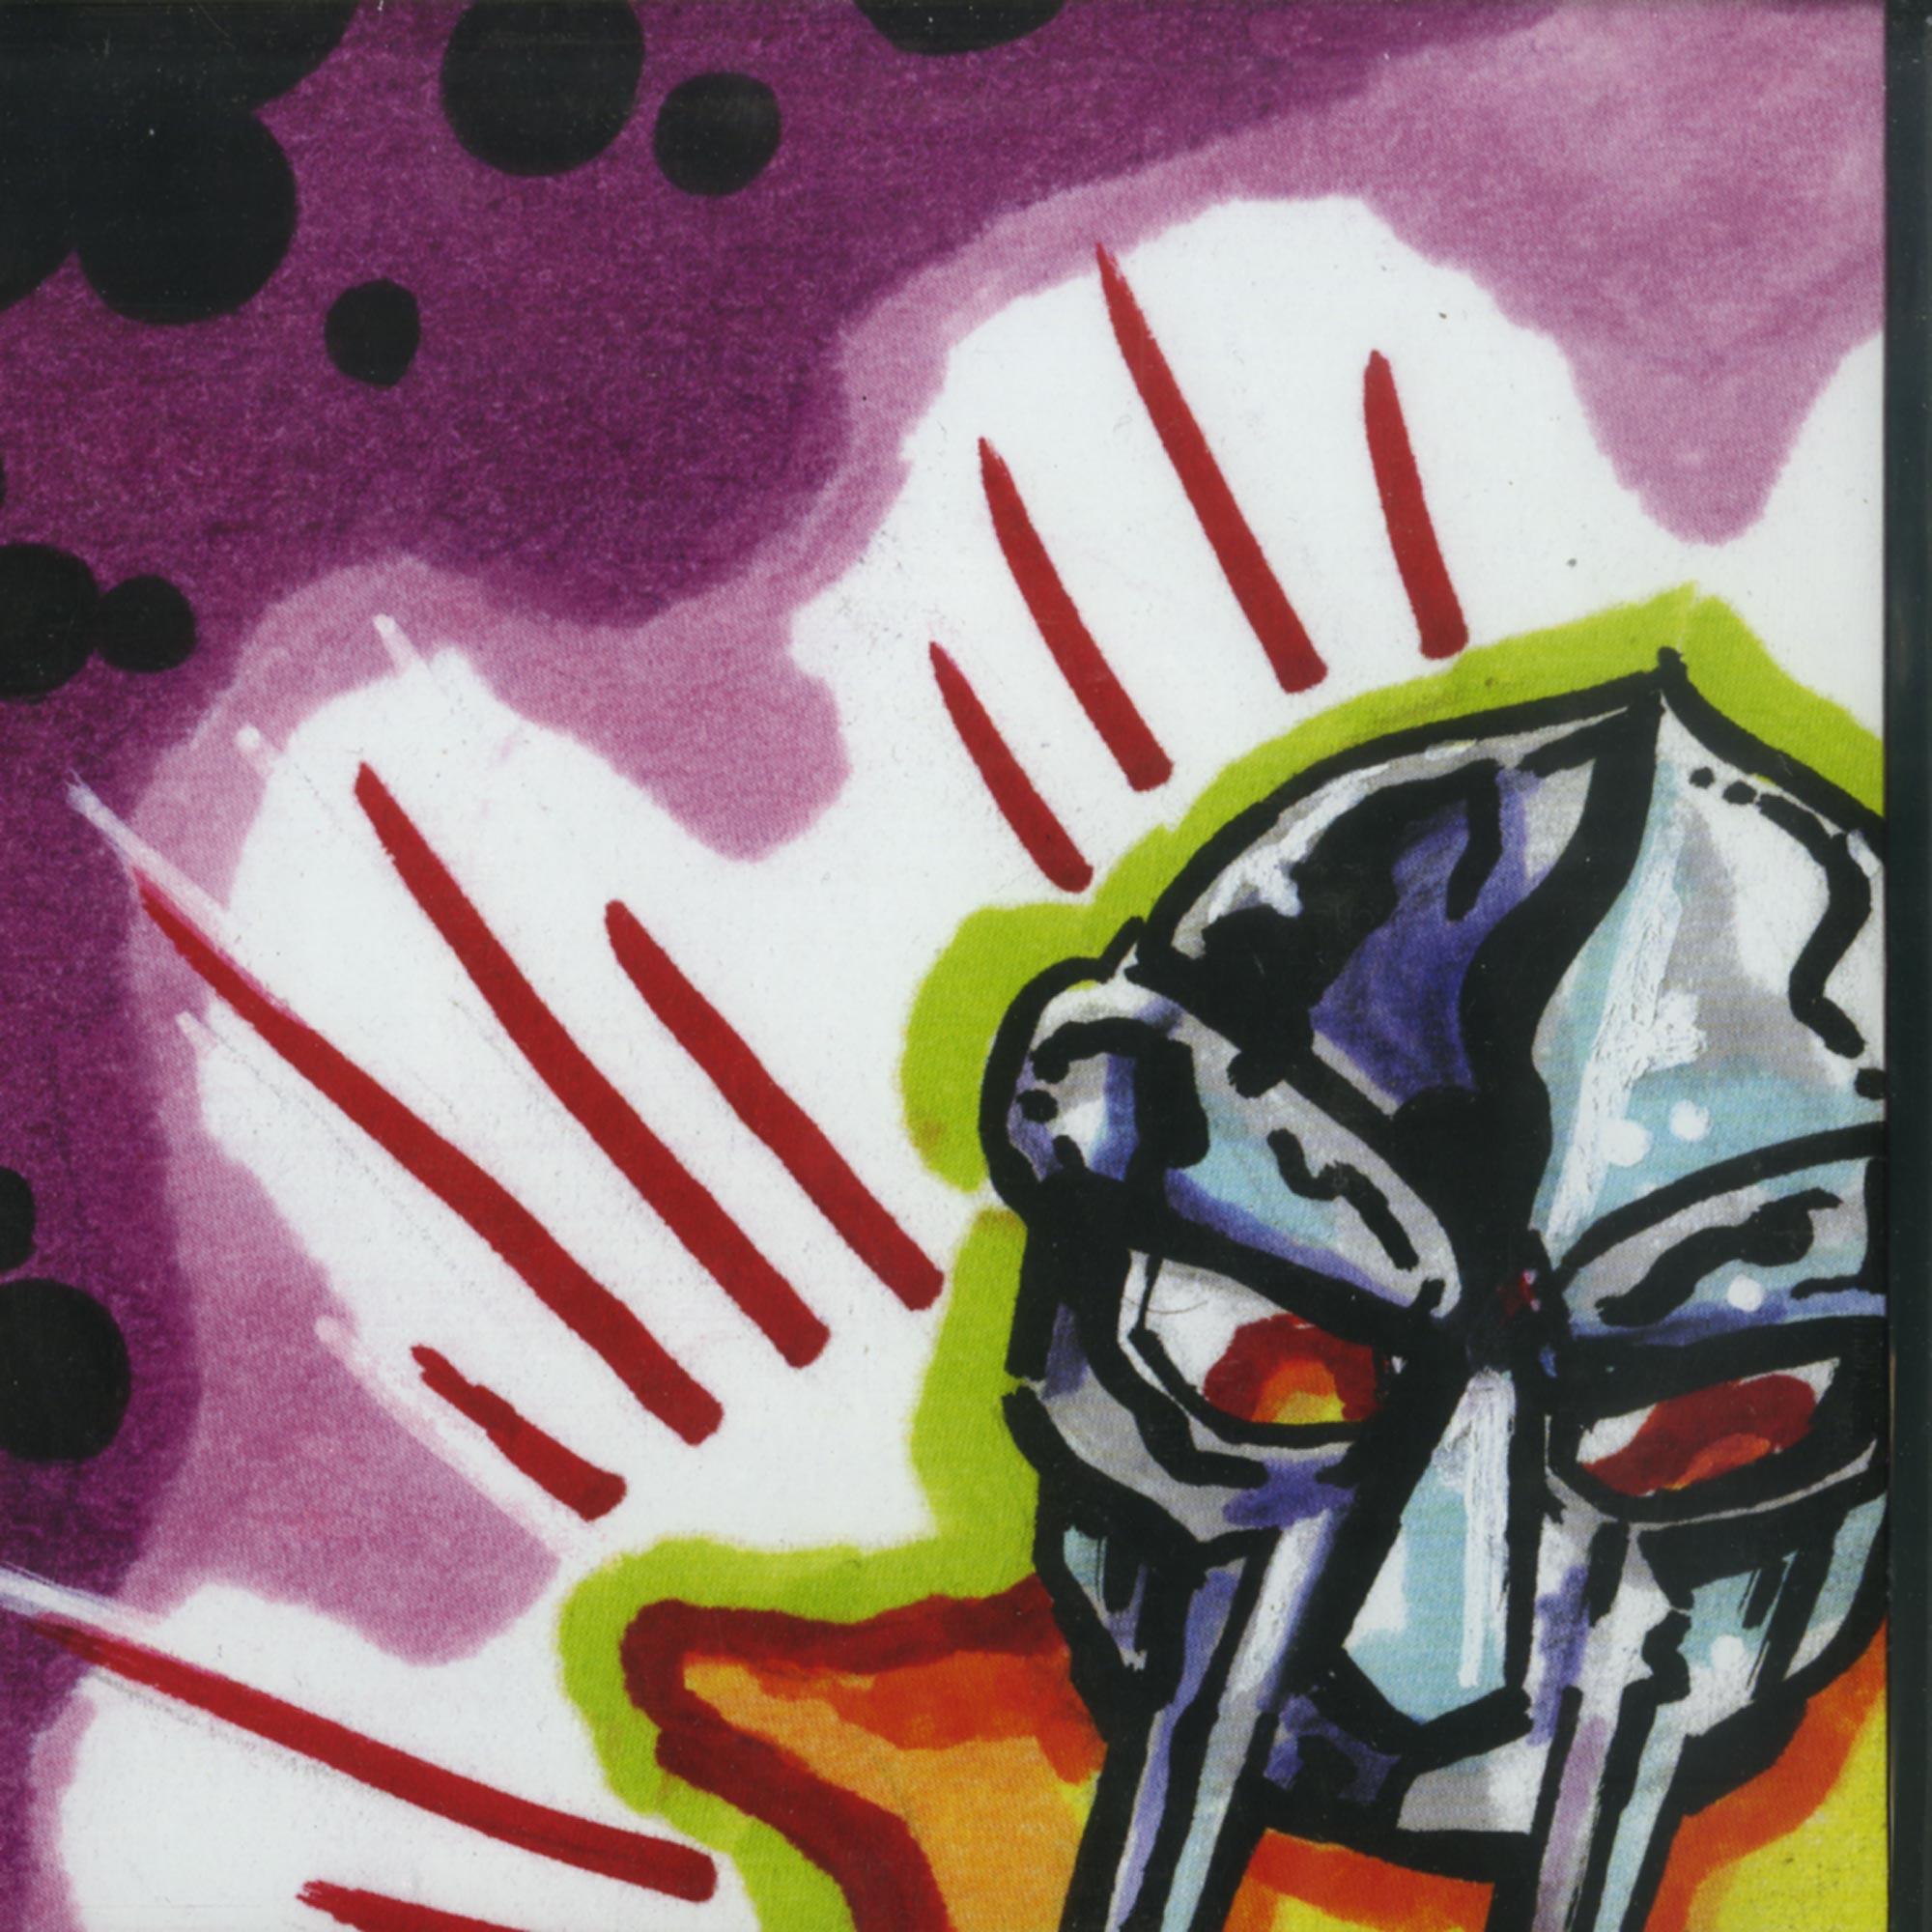 MF Doom - THE TIME WE FACED DOOM / DOOMSDAY